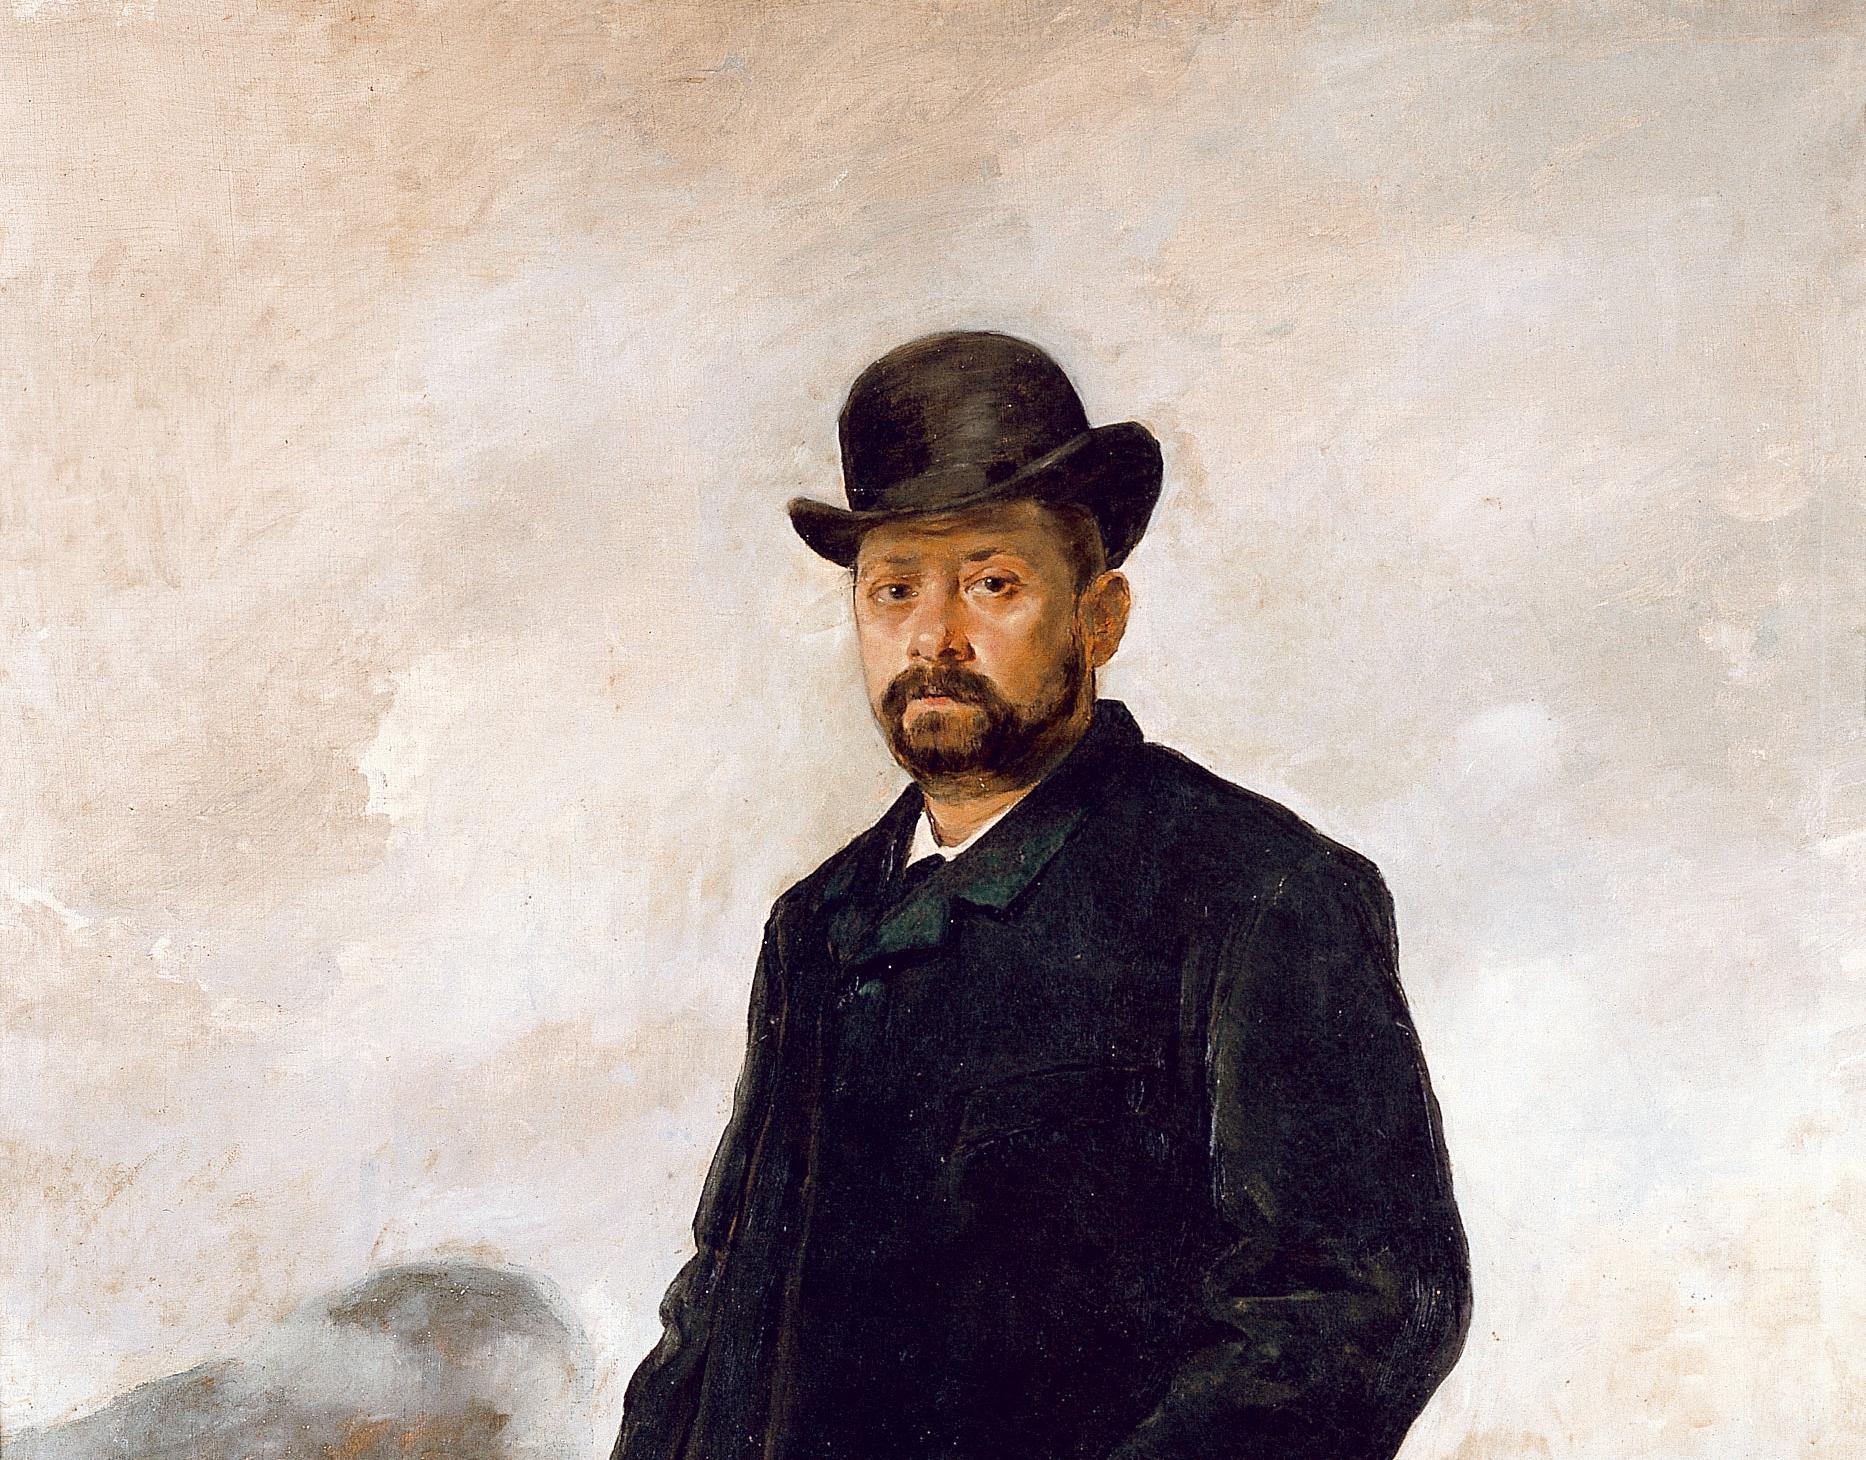 Retrato Augusto Comas (Invierno) -1885- (detalle)